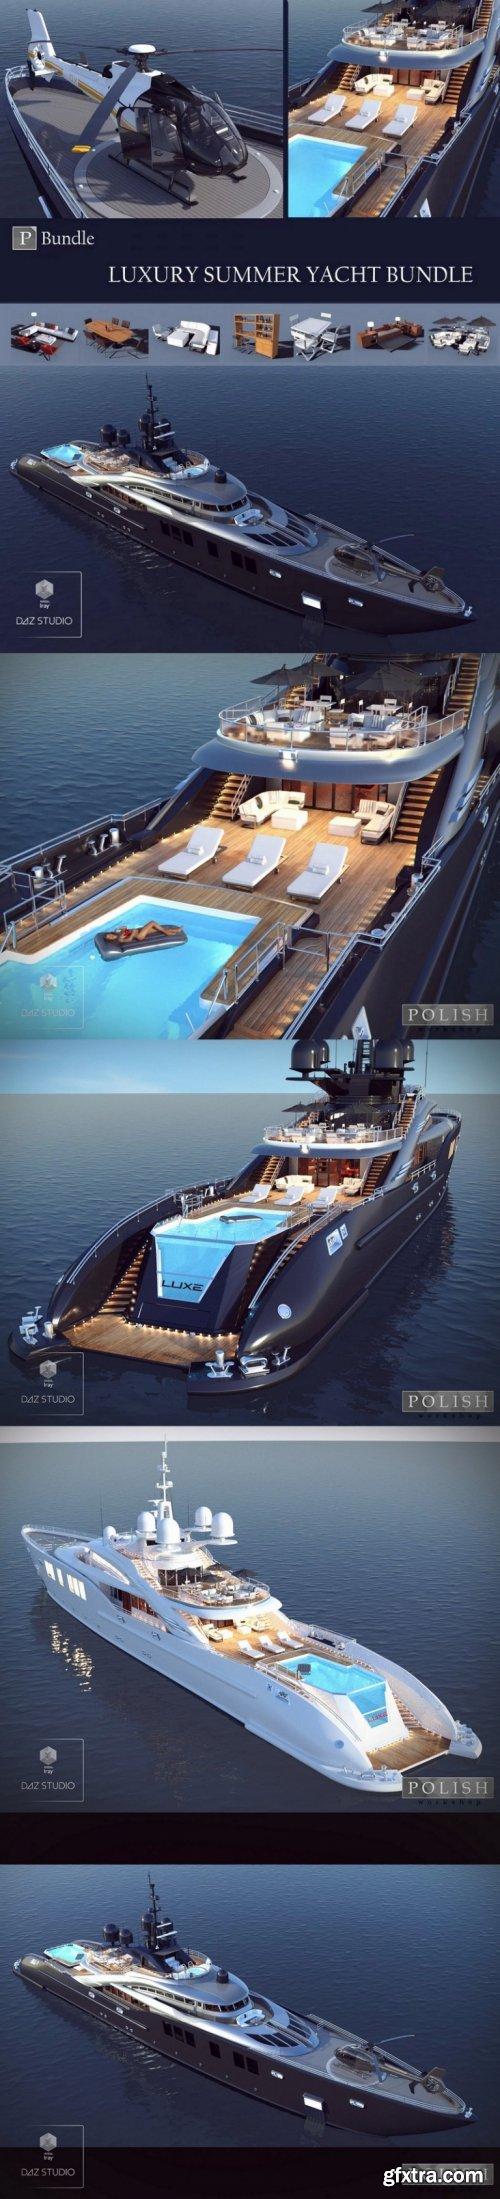 Luxury Summer Yacht Bundle